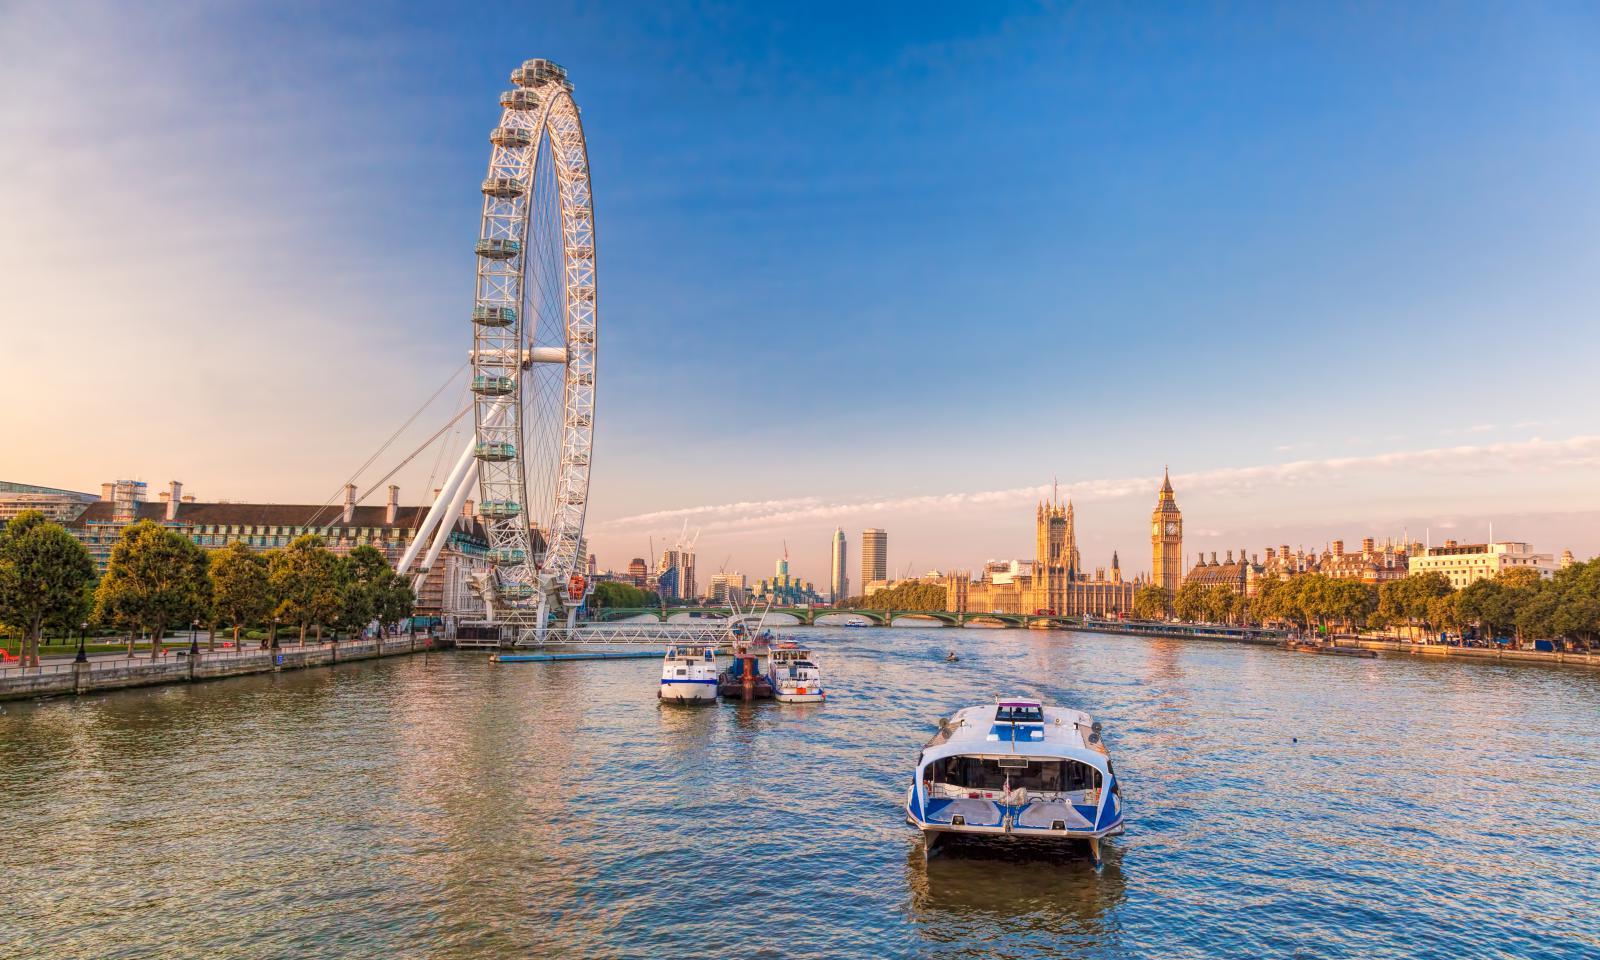 London Eye 170109190934001 1600x960 Loving London